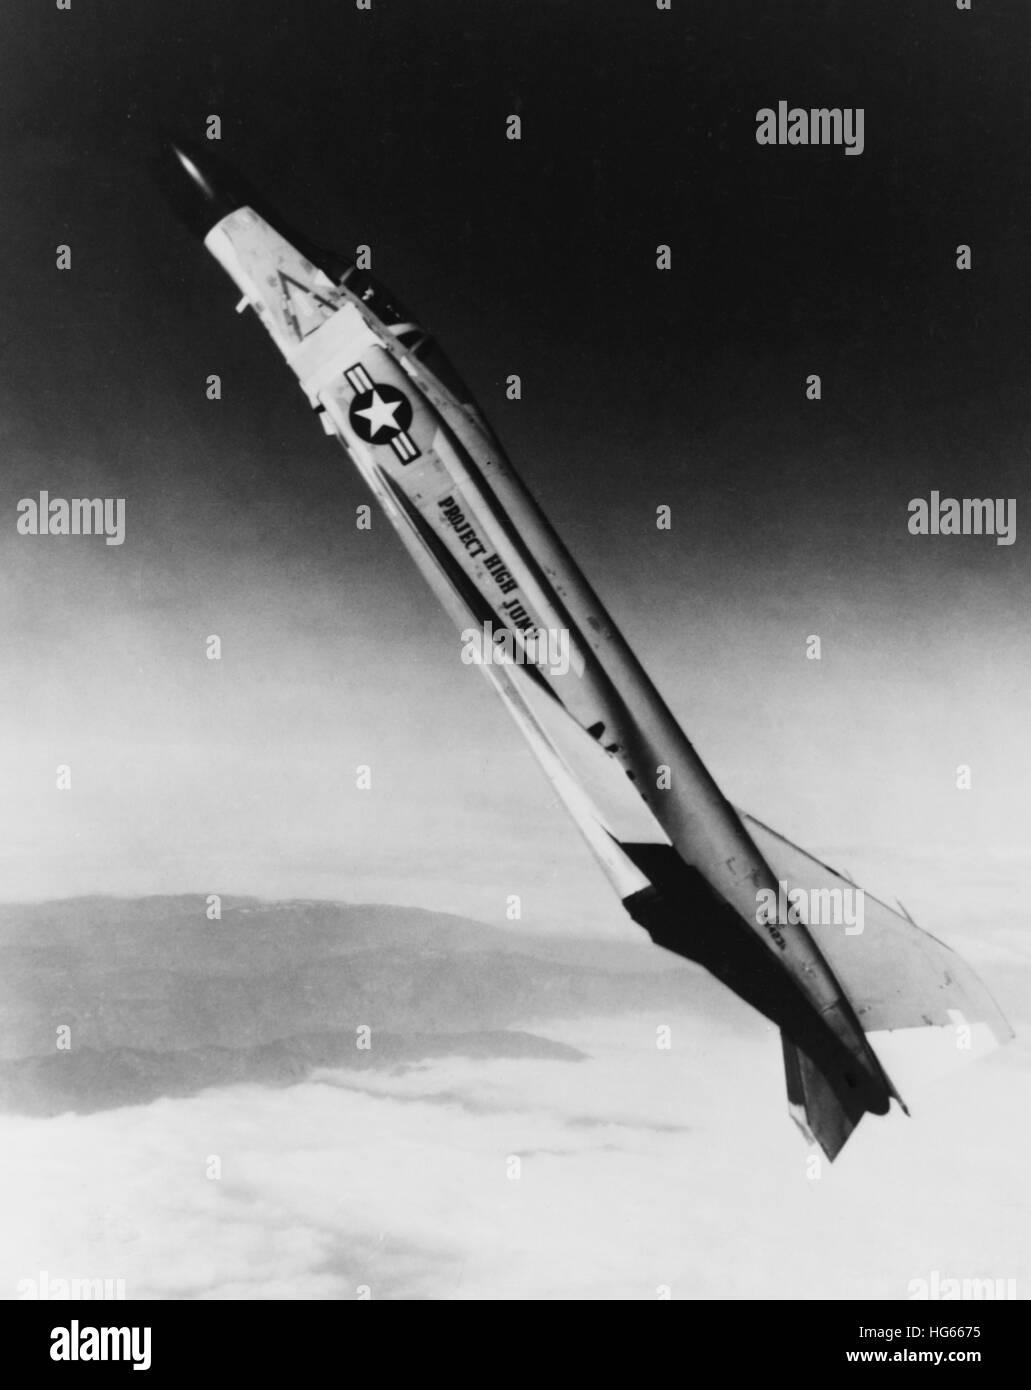 An F4H-1 Phantom II aircraft during Operation High Jump, circa 1962. - Stock Image